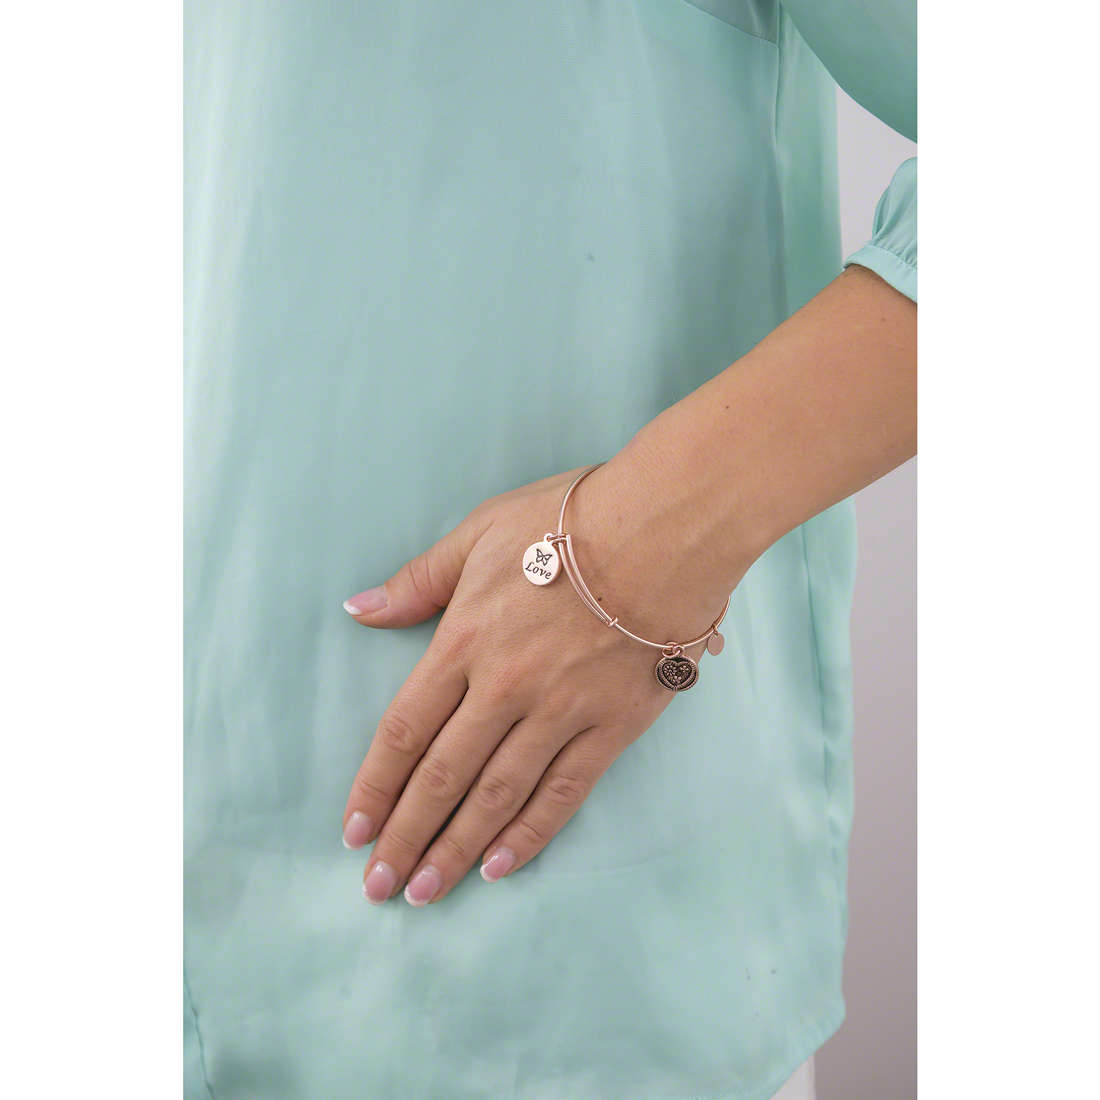 Chrysalis bracciali donna CRBT0304RG indosso